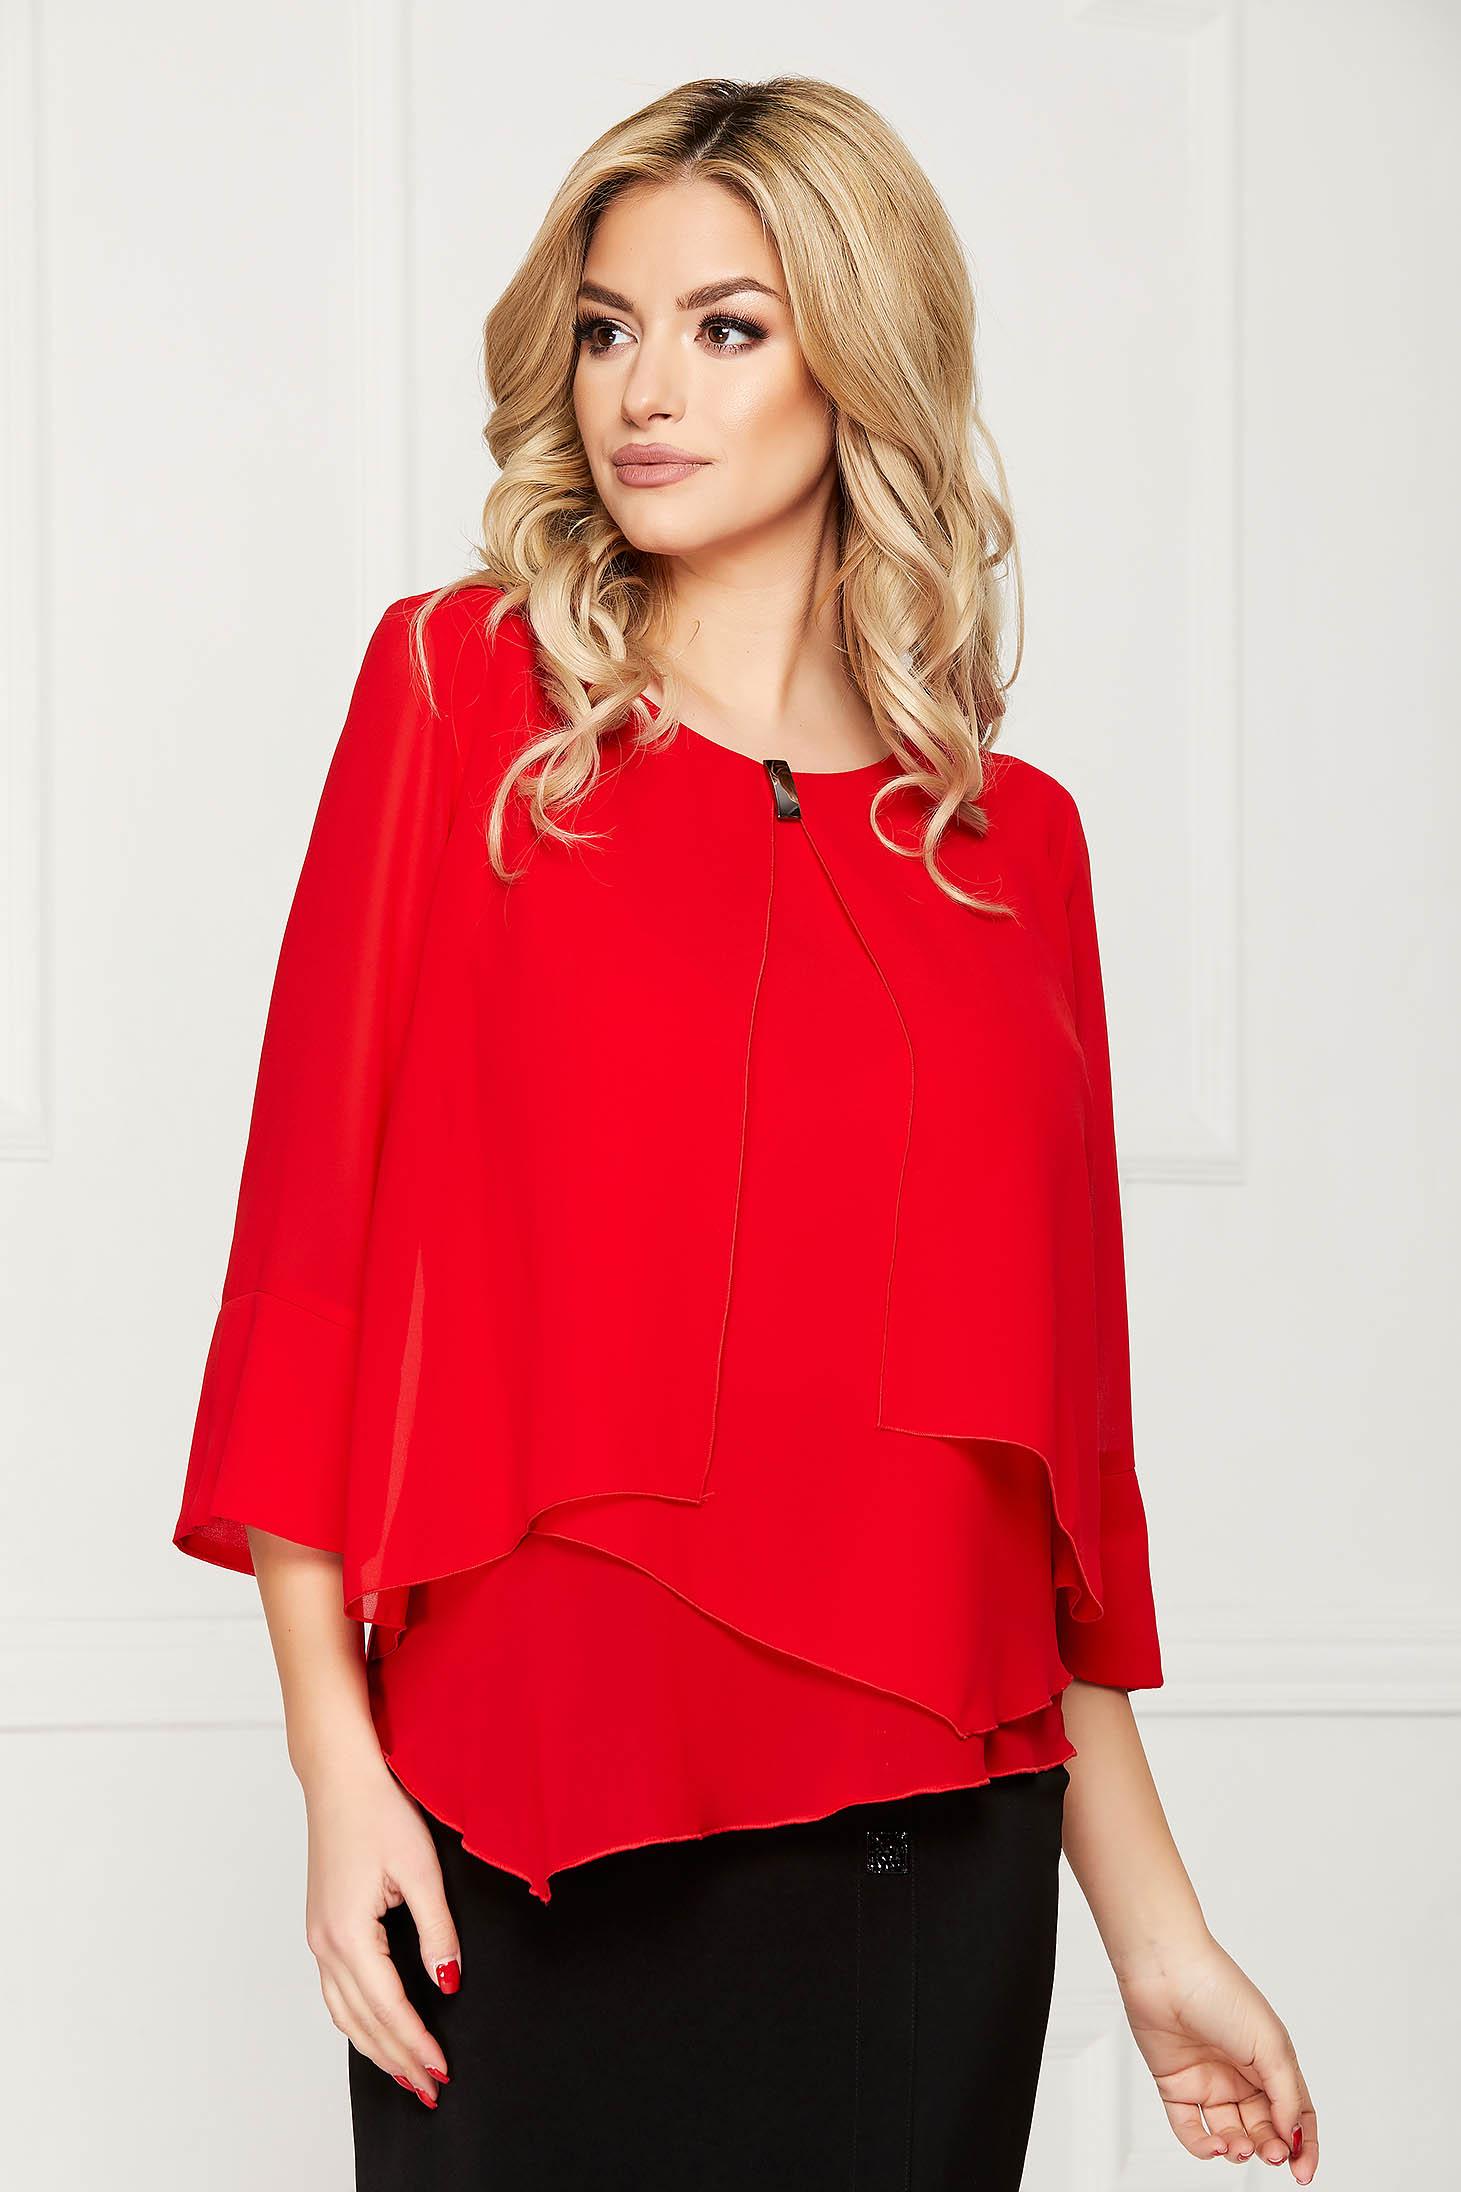 Bluza dama rosie office scurta din voal cu croi larg asimetrica cu accesorii metalice